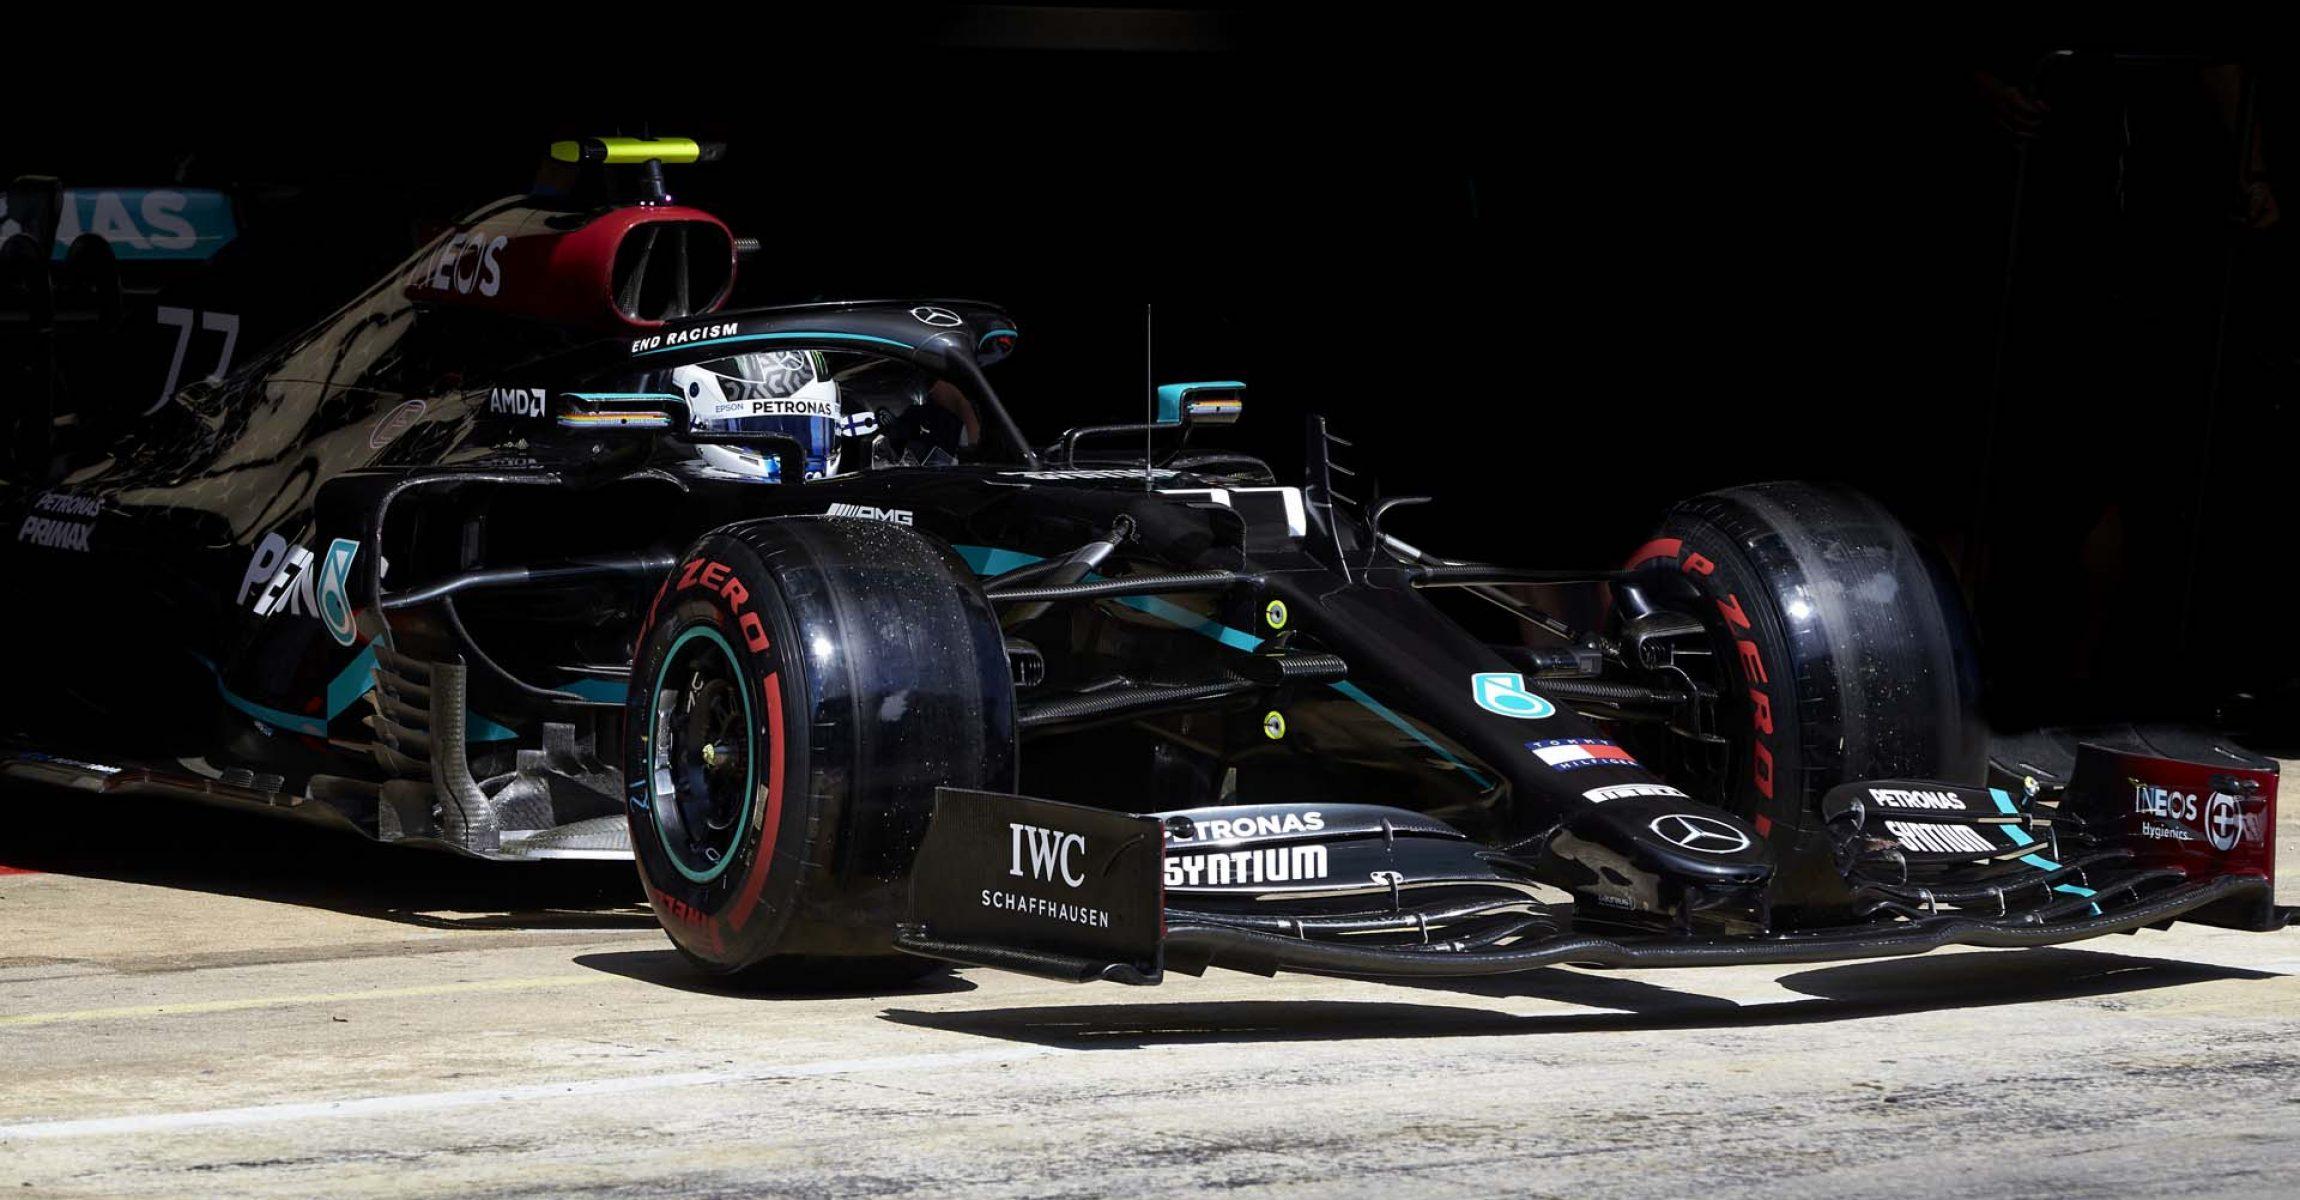 2020 Spanish Grand Prix, Saturday - Steve Etherington Valtteri Bottas Mercedes